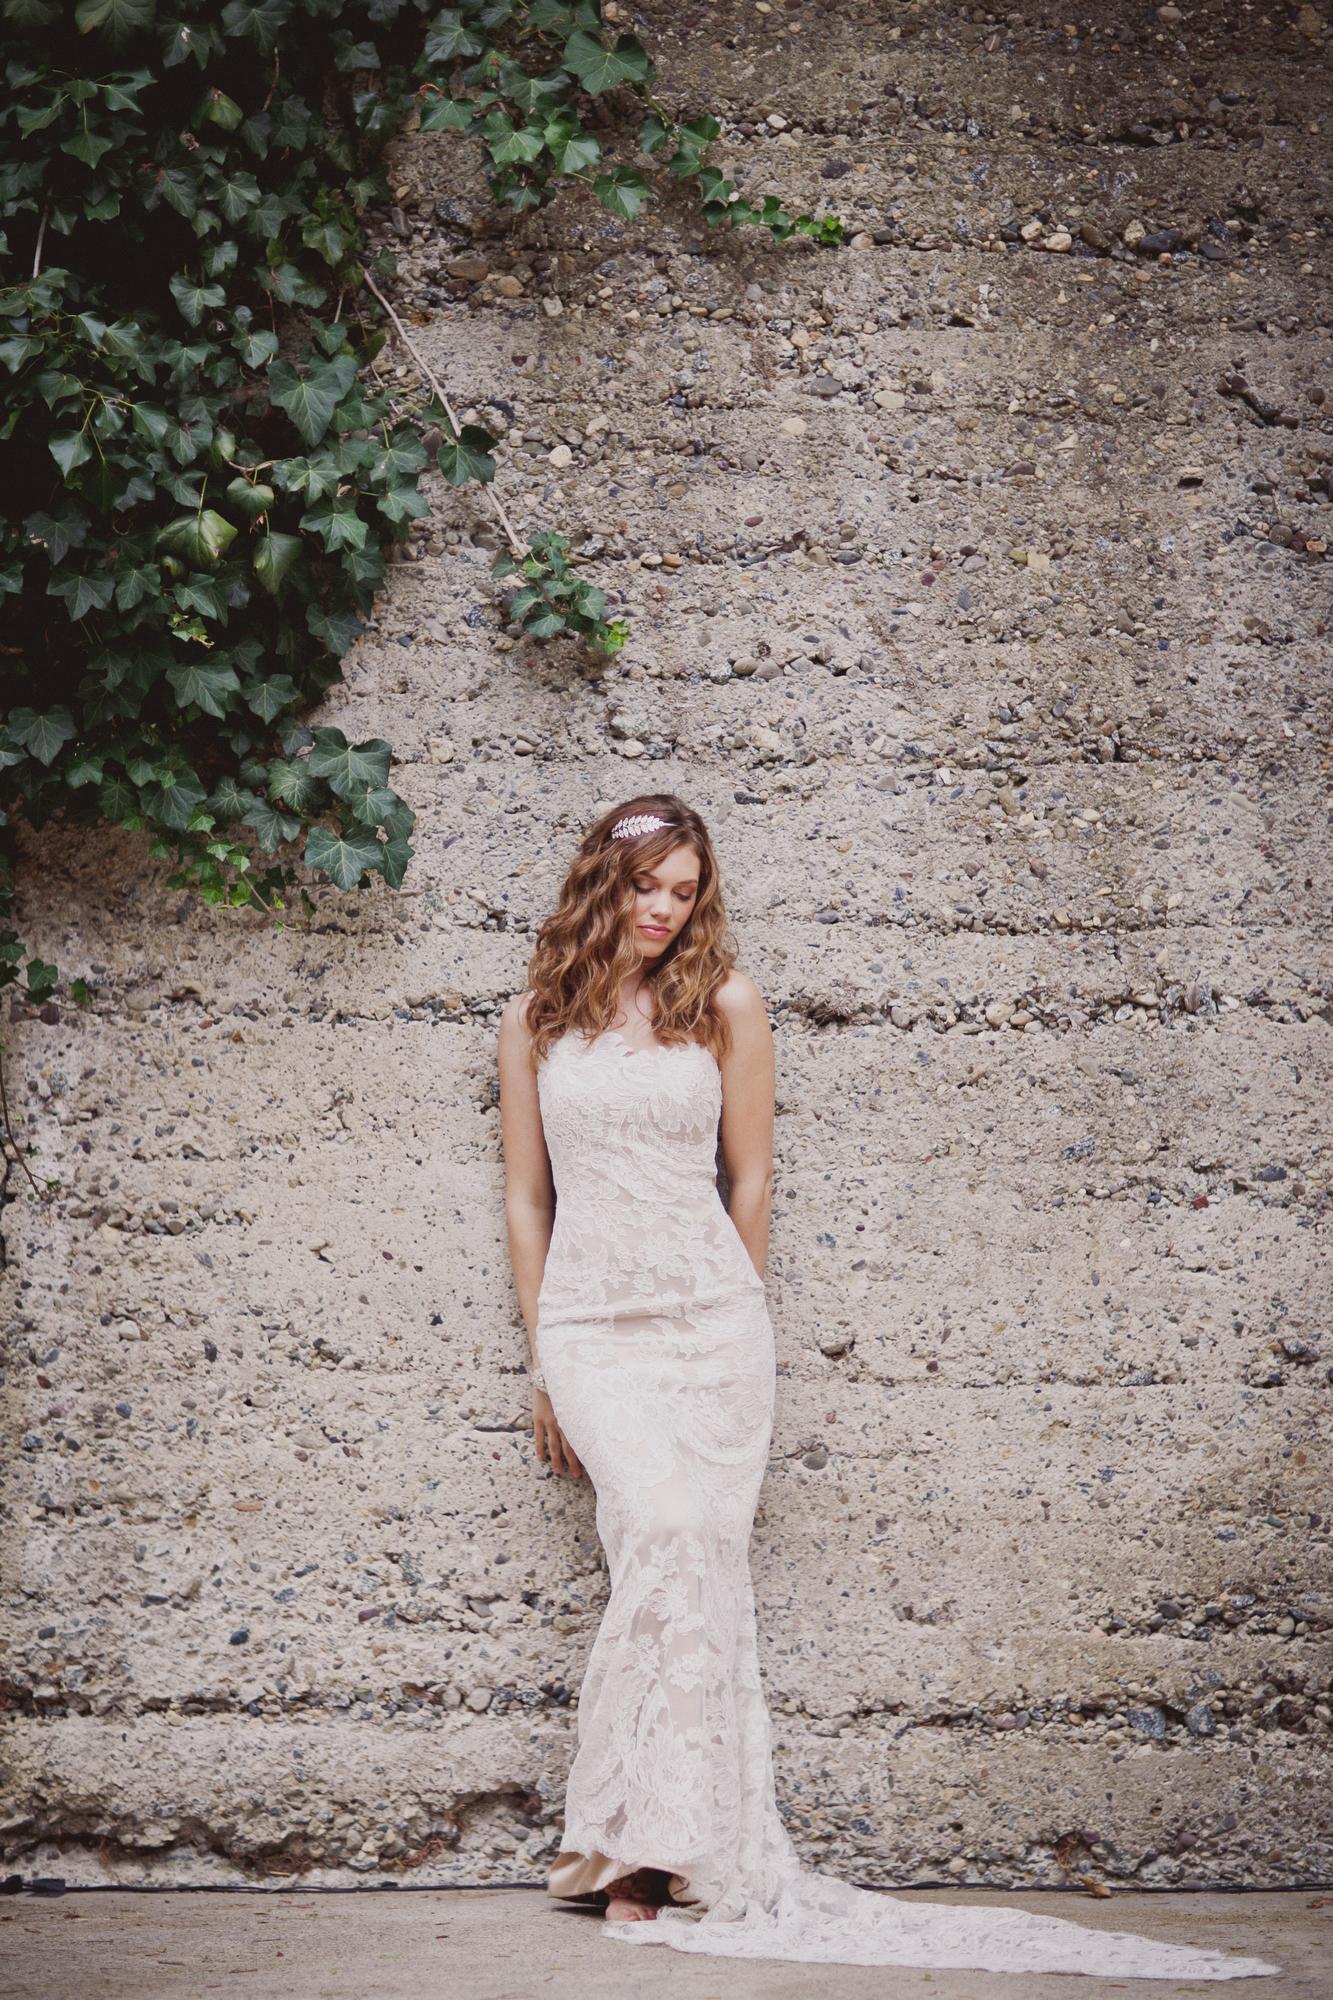 jennifer-skog-bridal-fashion-photographer-lifestyle-0008.jpg